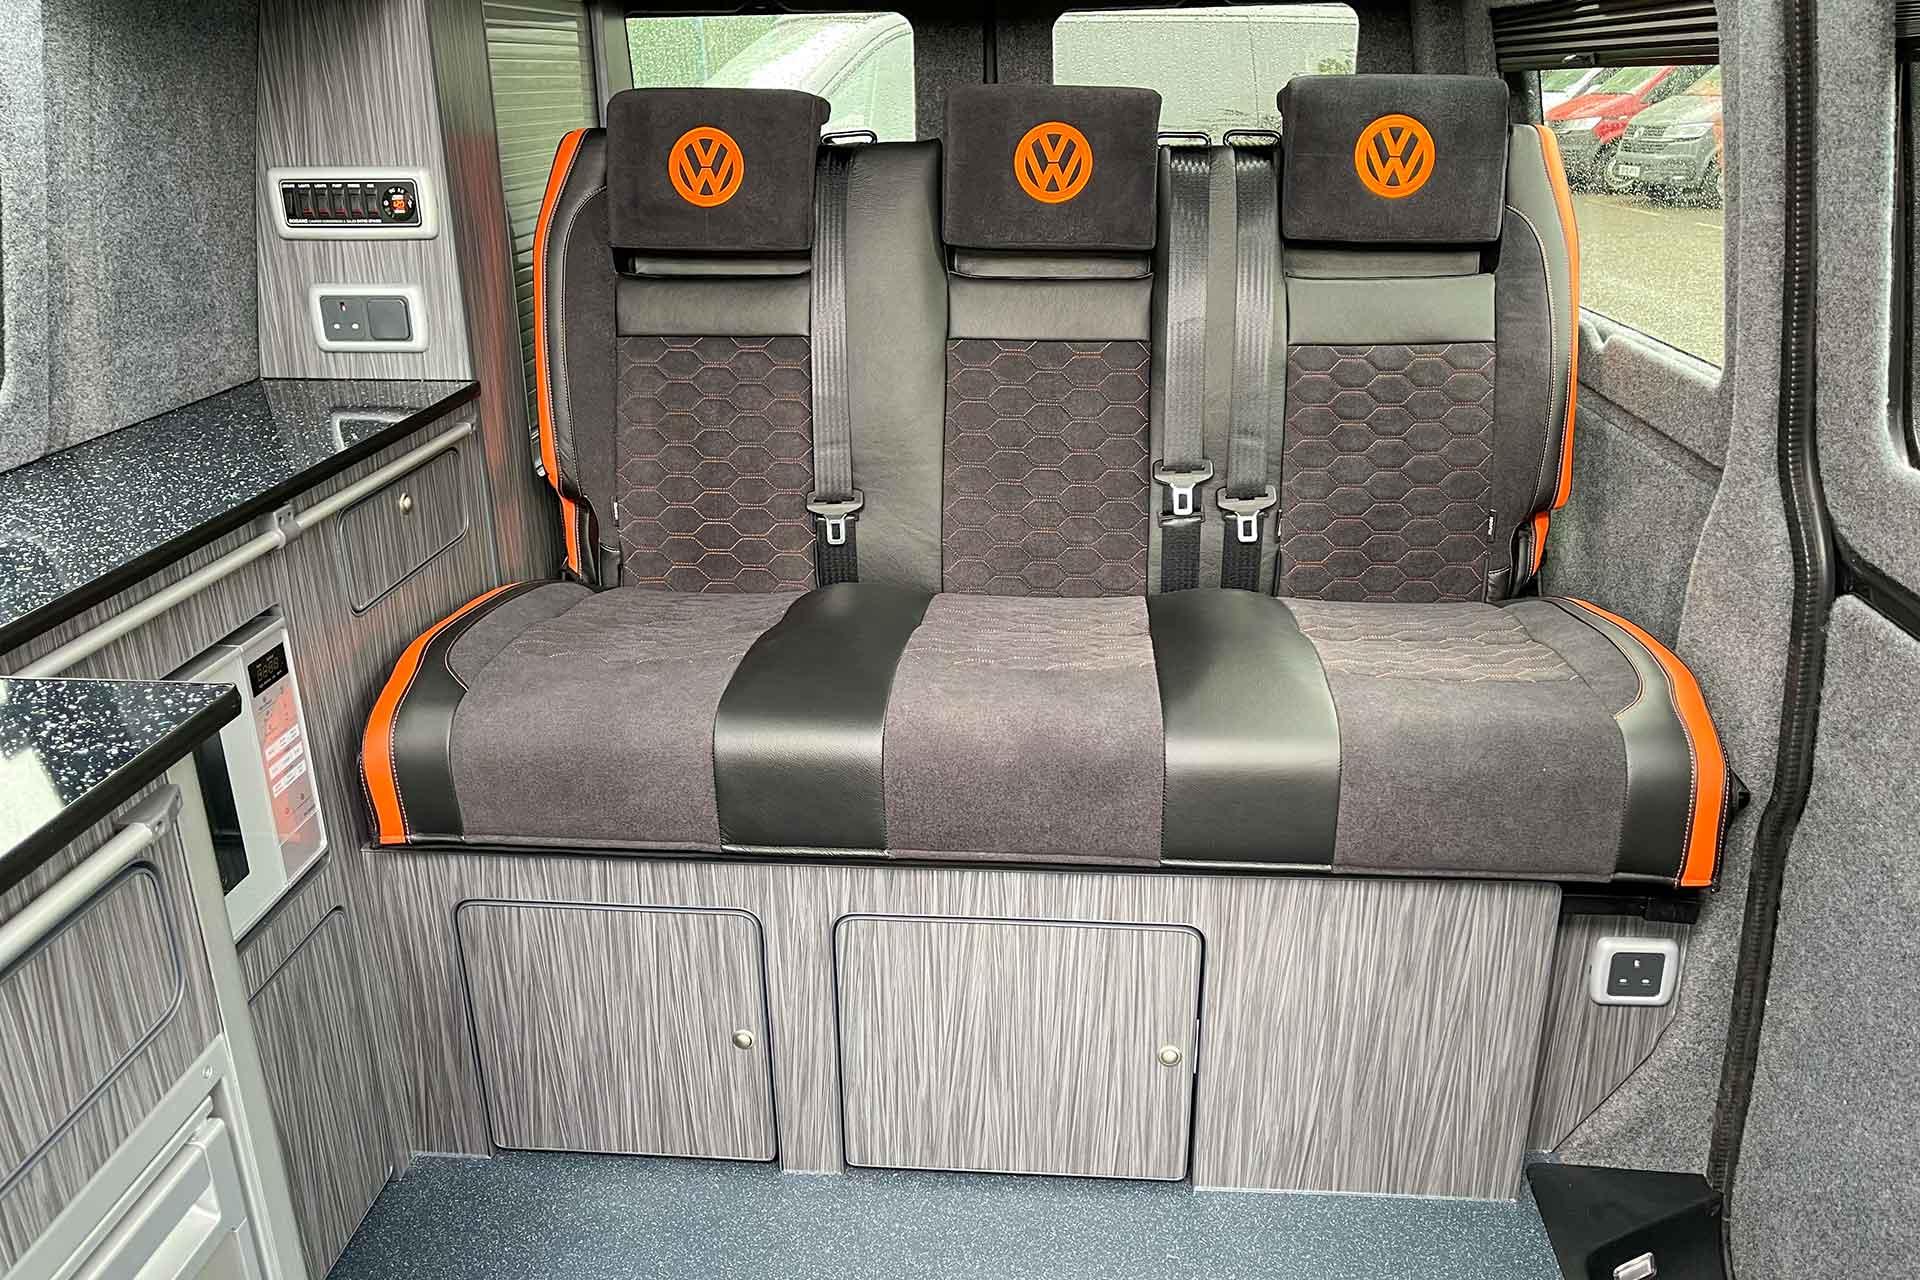 RIB Altair Bed For VW Campervan